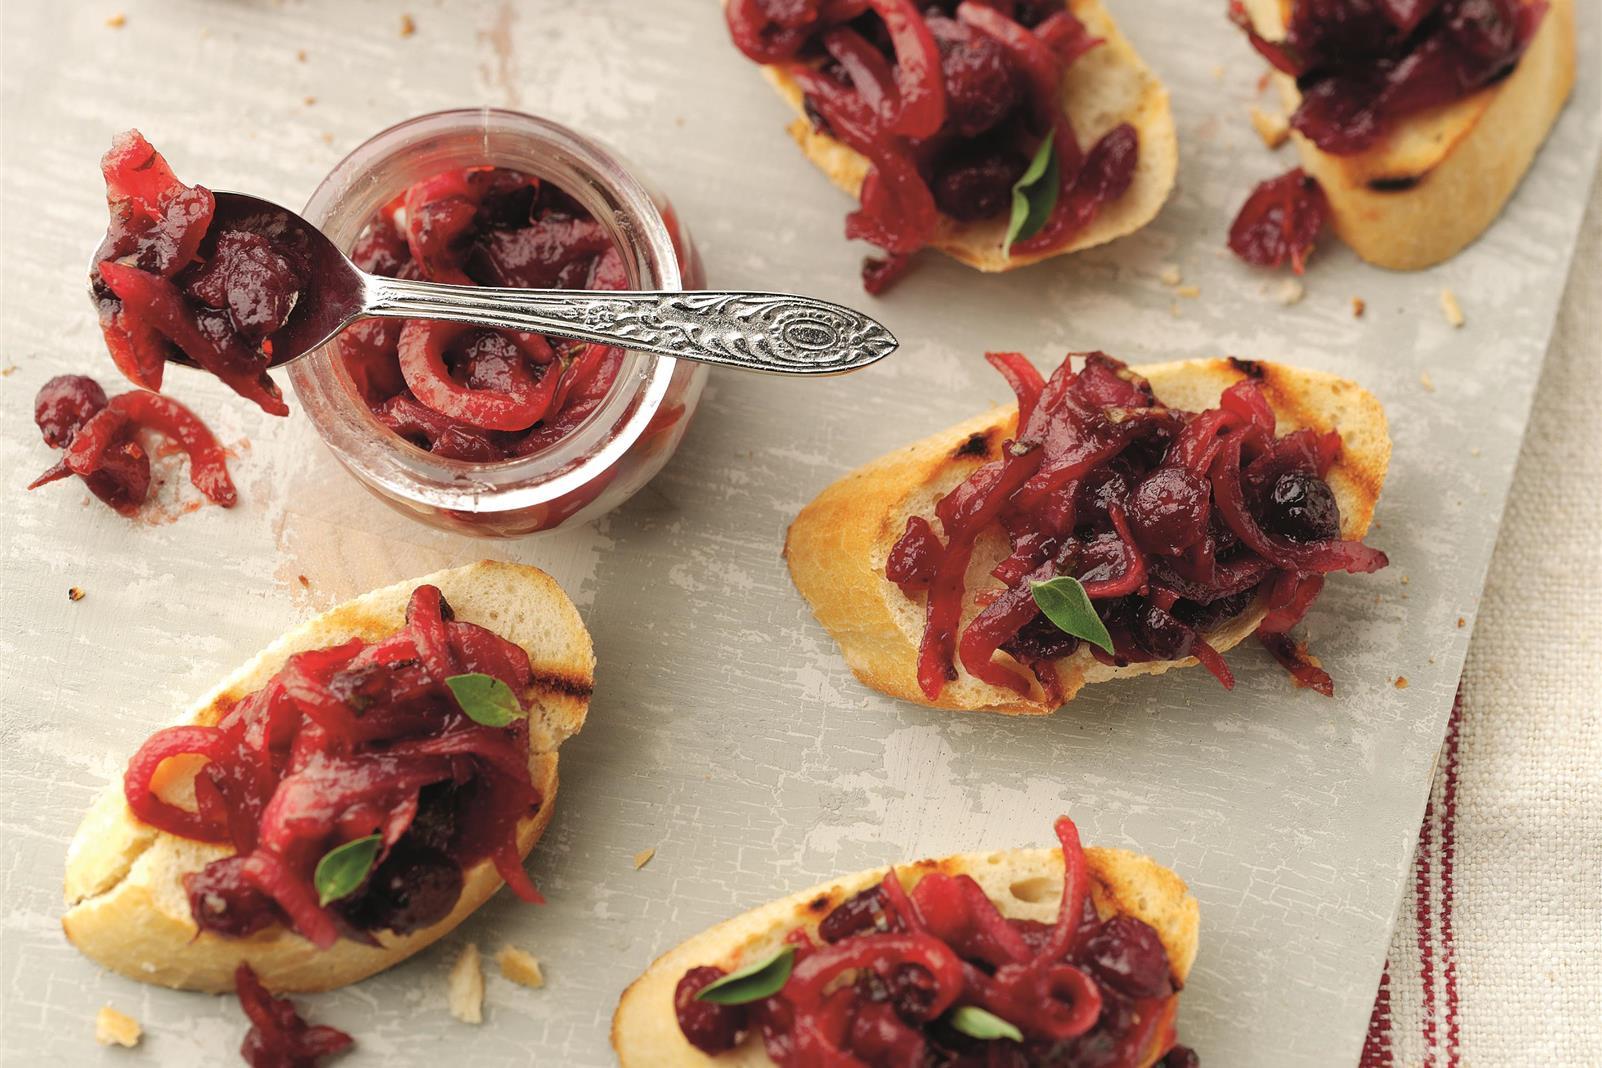 Cranberry Bruschetta